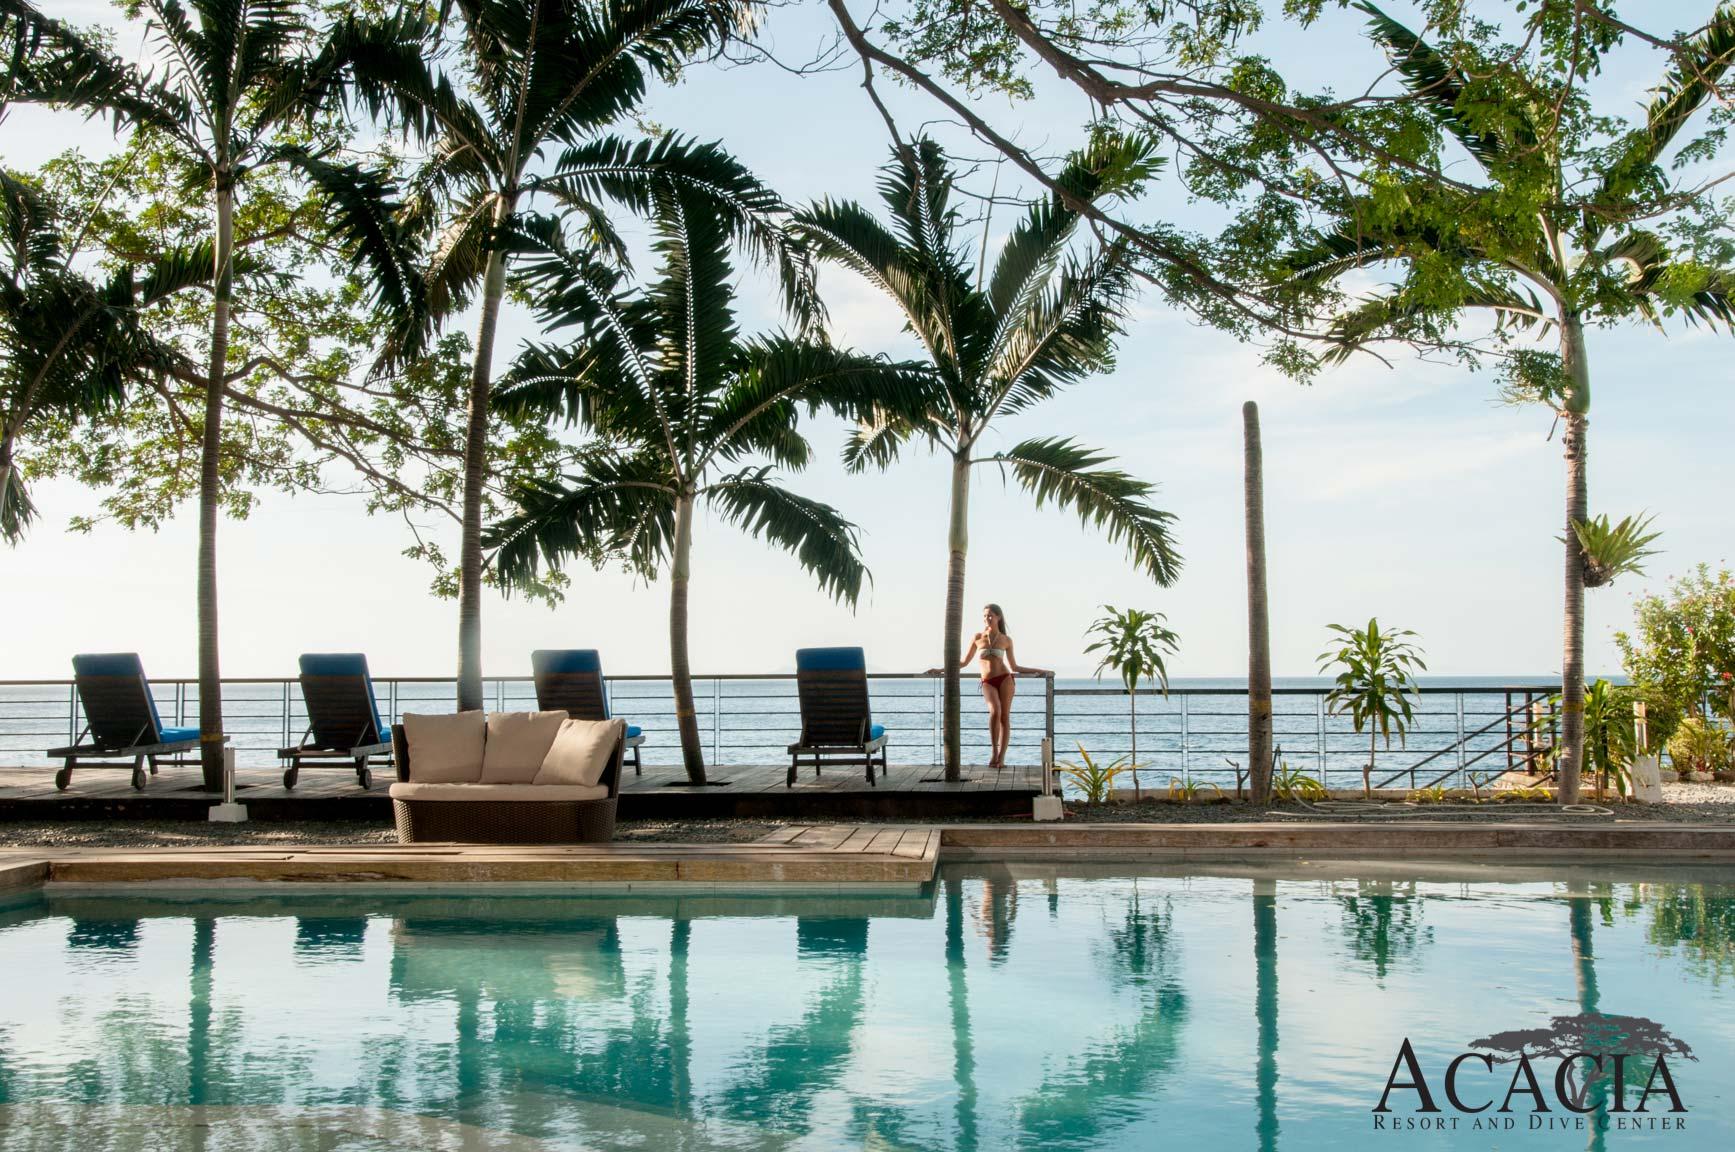 20 best beach resorts in batangas room rates and swimming - Acacia dive resort ...